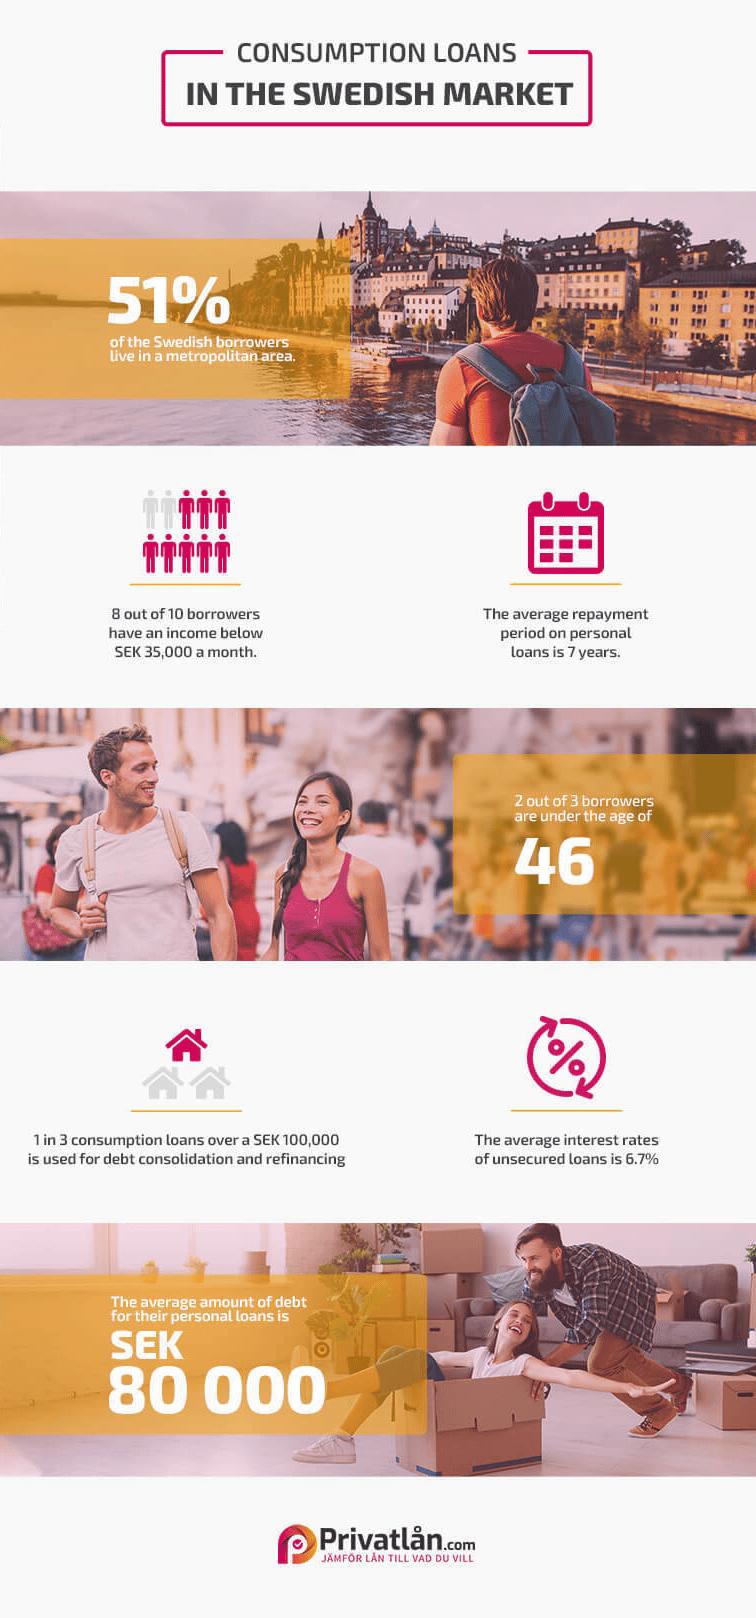 Infographic Privatlån Swedish consumption loans